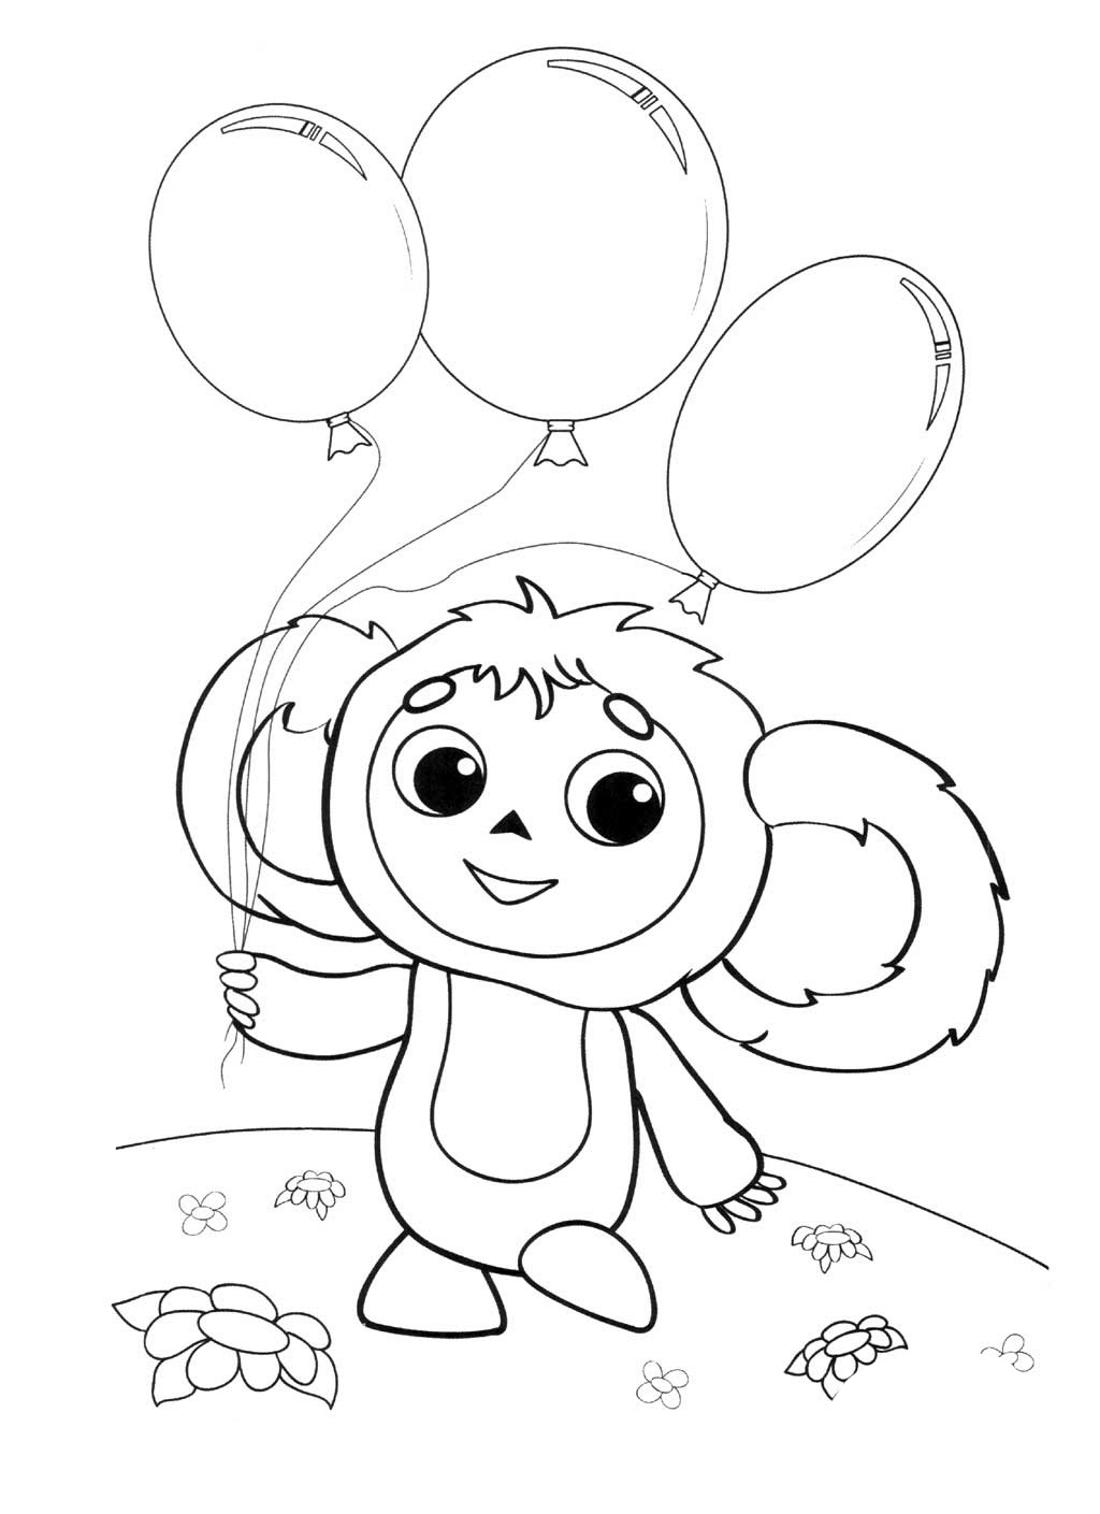 Чебурашка с шариками - раскраска №694 | Printonic.ru